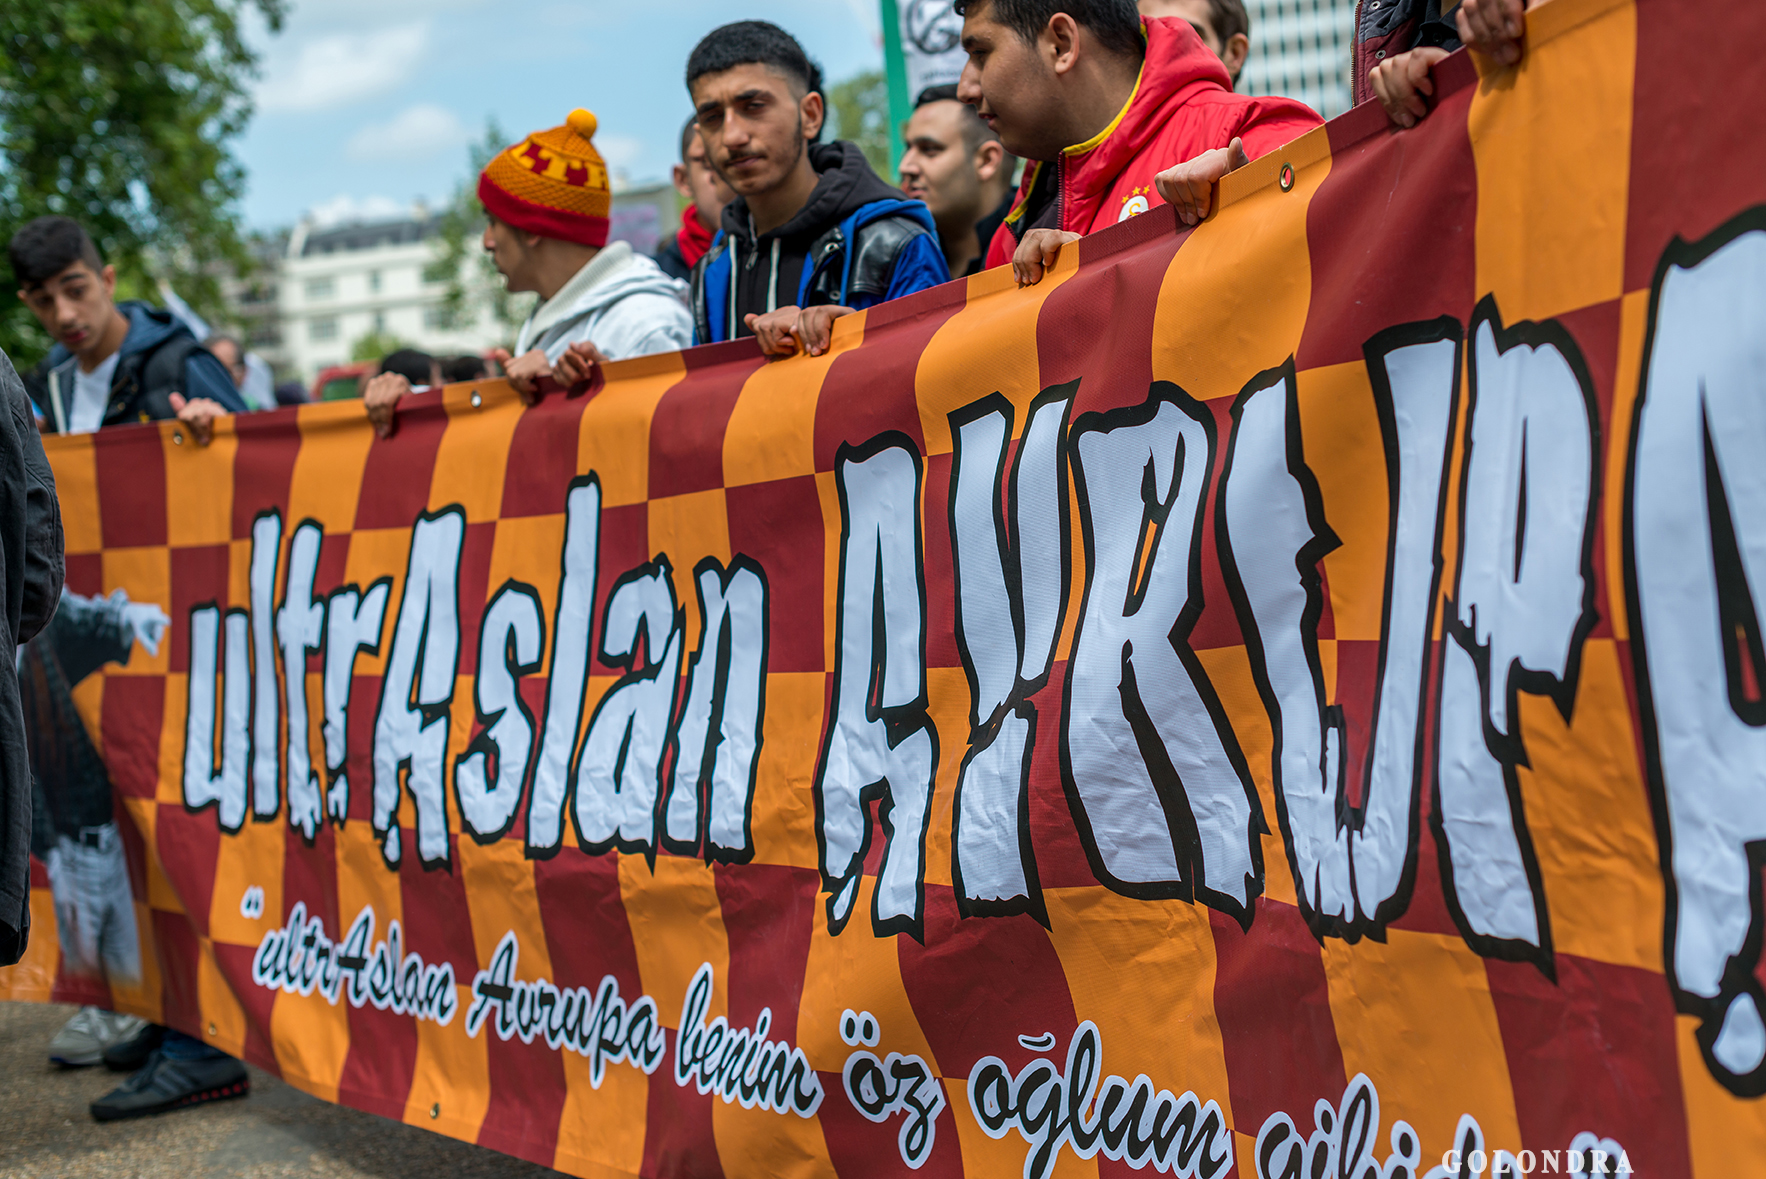 Protesting Turkish Government - Turk Hukumetini Protesto - Londra - London (20)